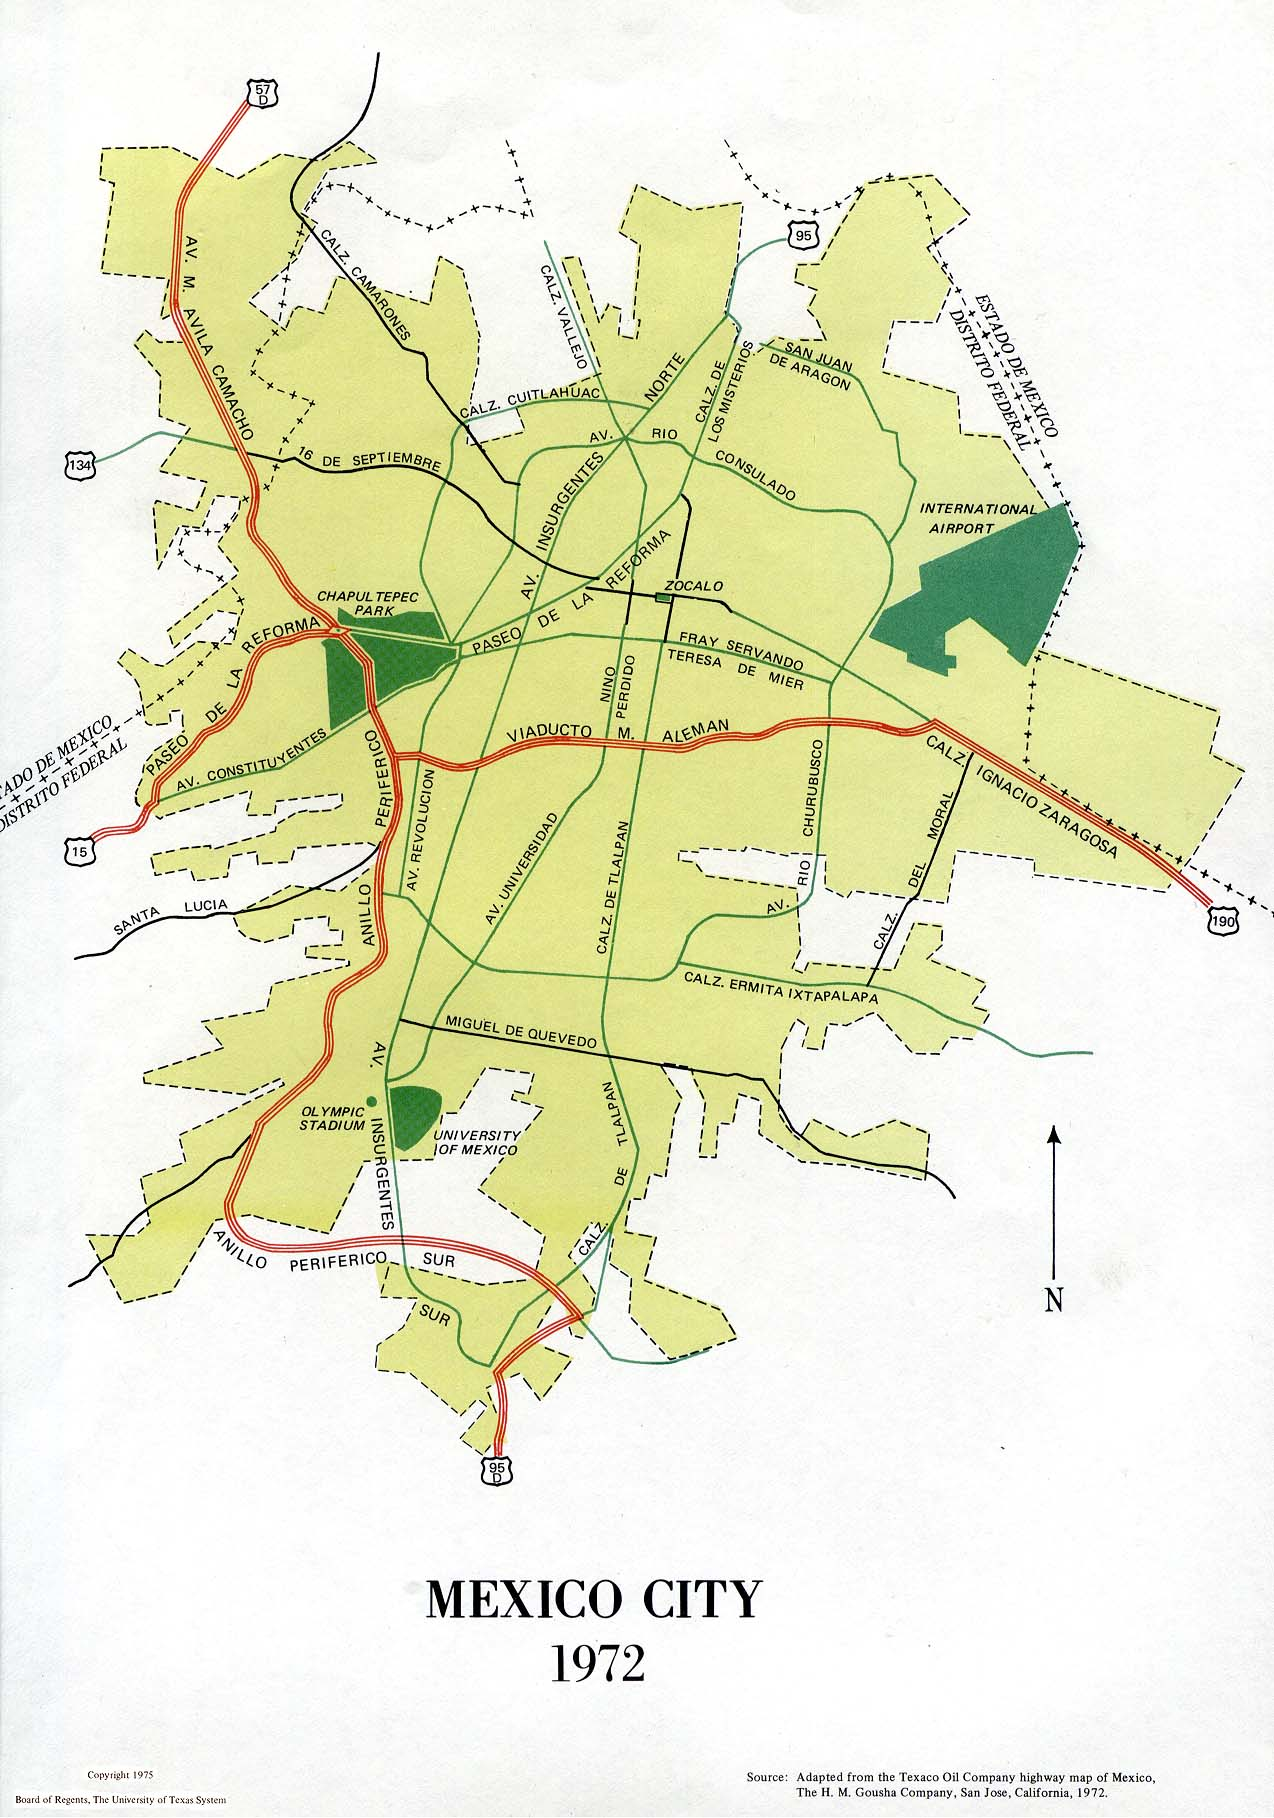 Mexico City Map, Mexico